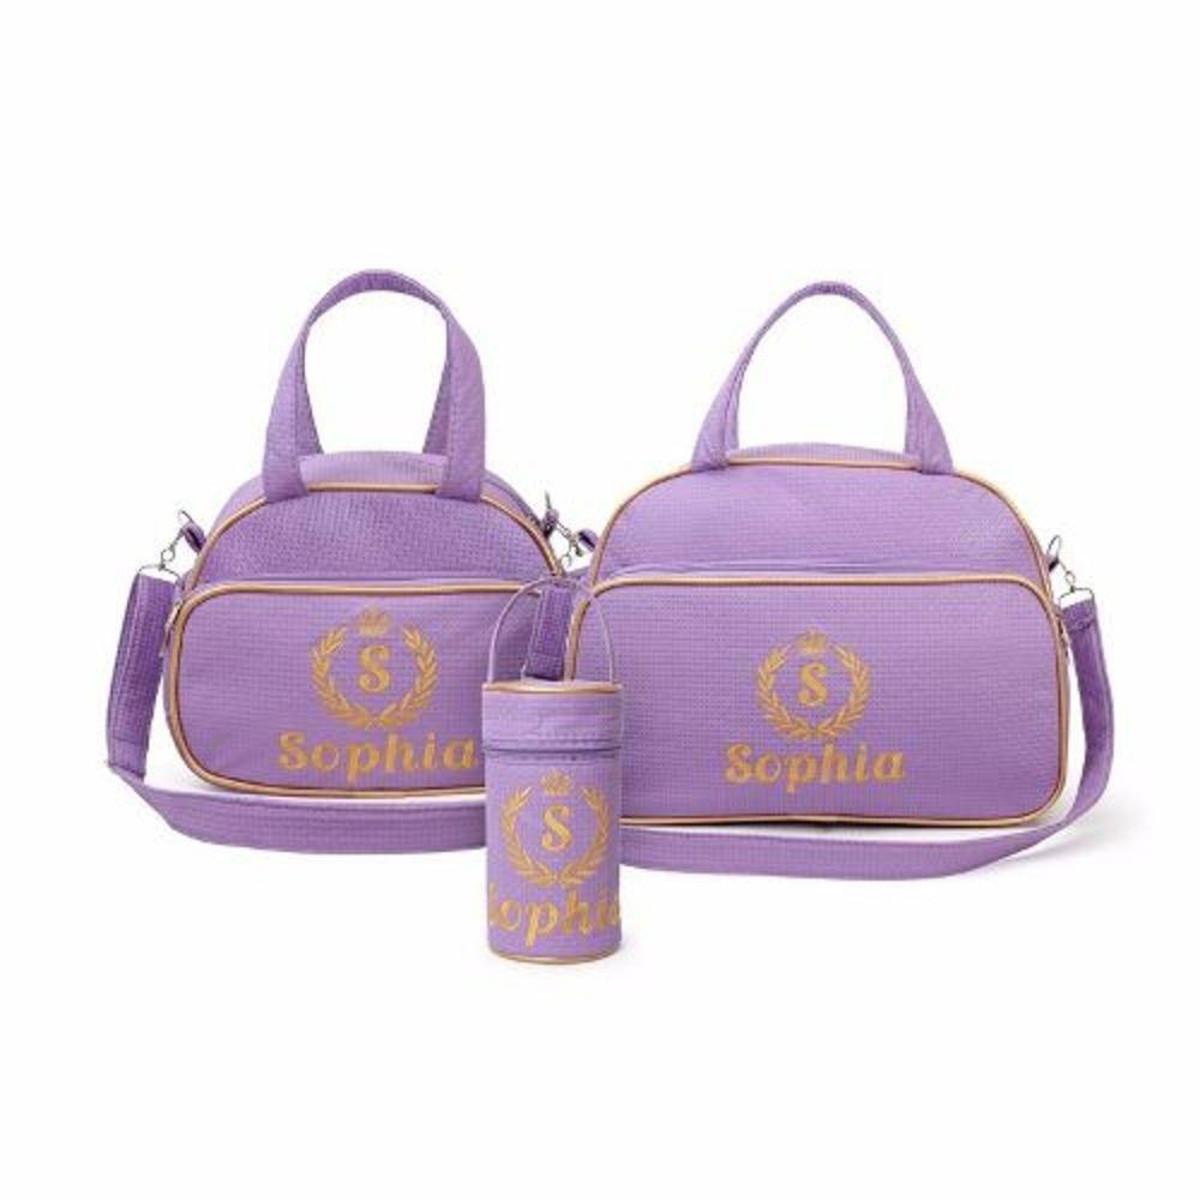 b38473fe3f Zoom · Bolsa Maternidade 170 Realeza Lilás Personalizada - 3 peças